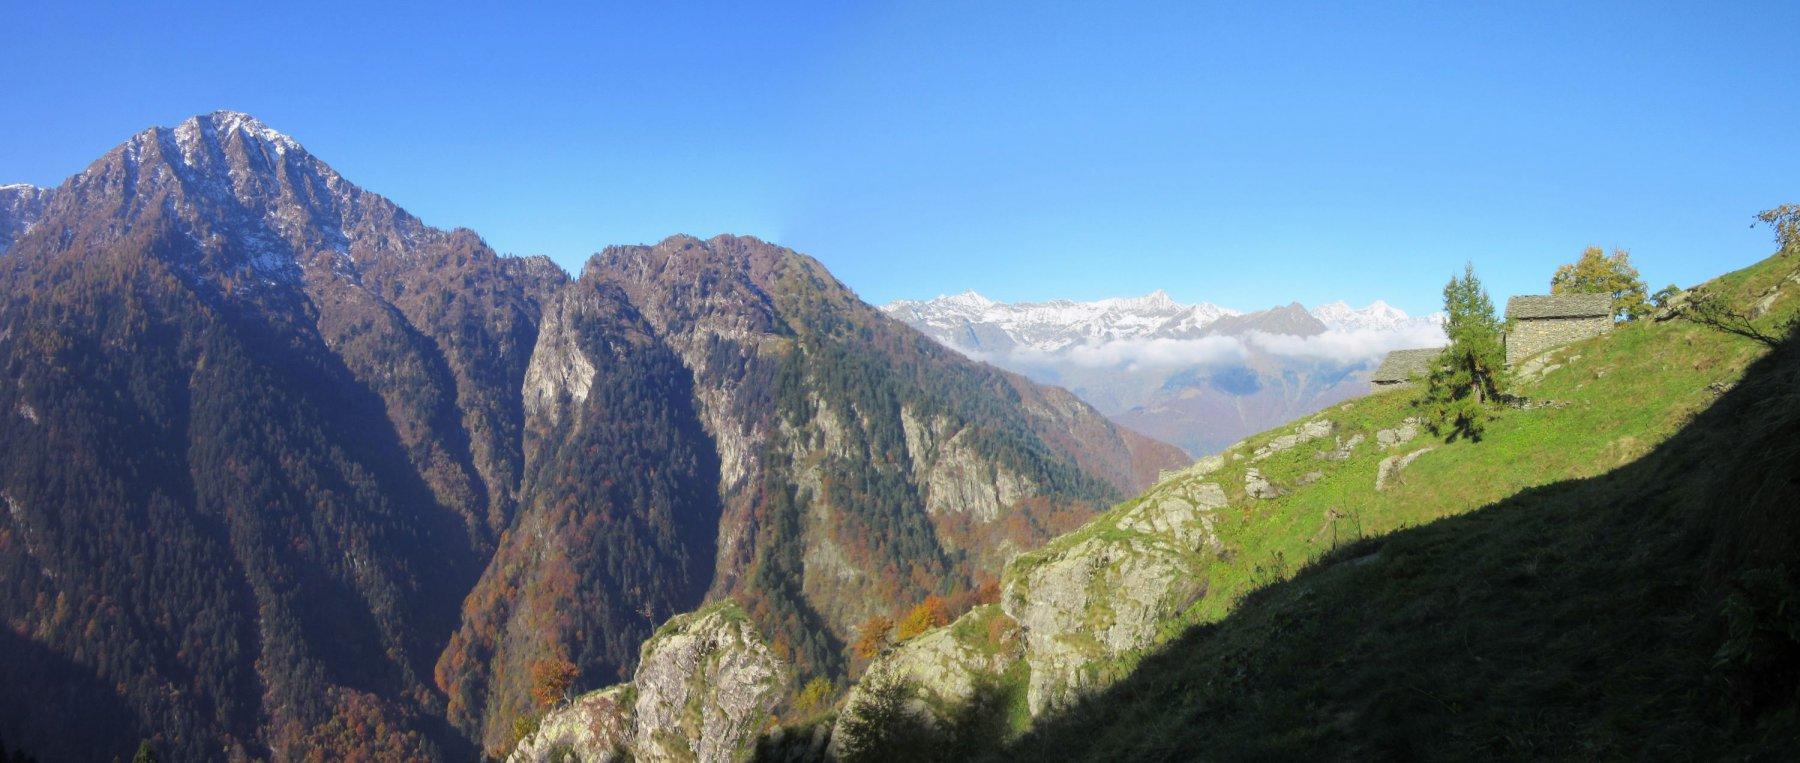 Panorama dall'alpe Camino